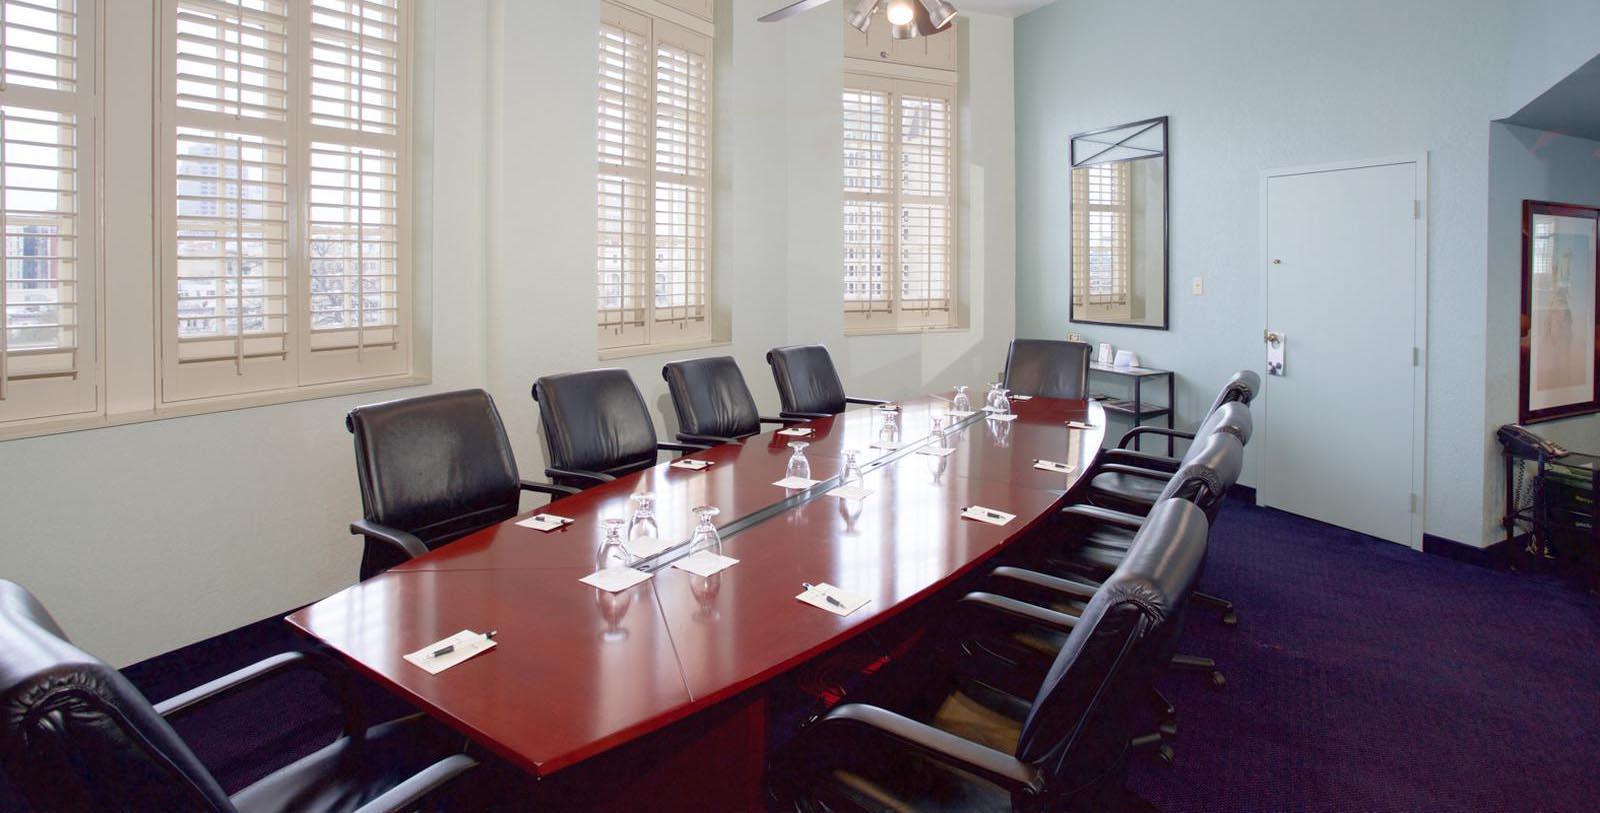 Image of Meeting Room The Crockett Hotel, 1909, Member of Historic Hotels of America, in San Antonio, Texas, Experience